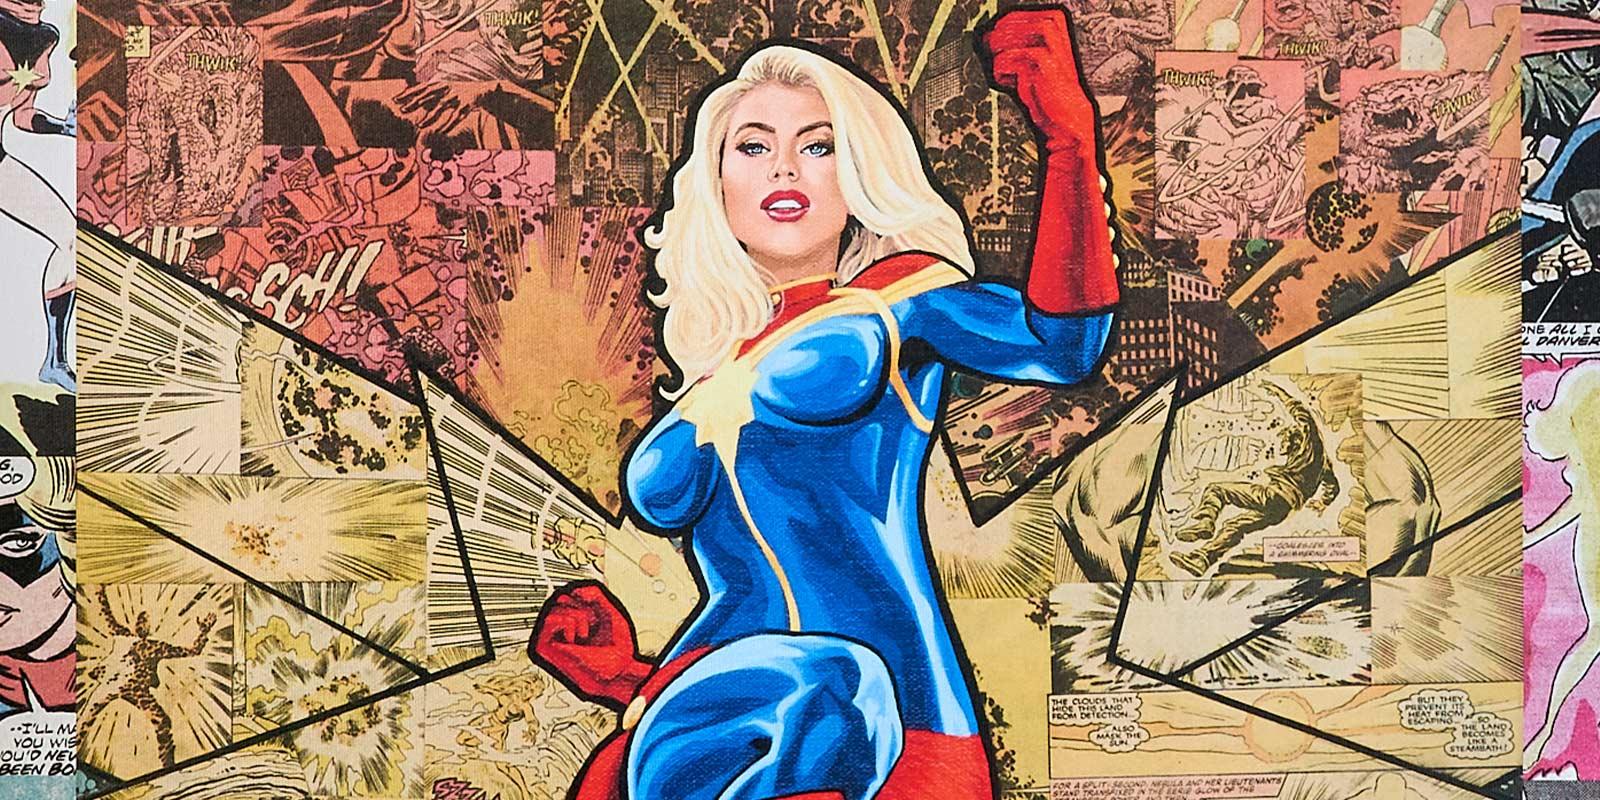 Randy Martinez Captain Marvel Premium Modern Art